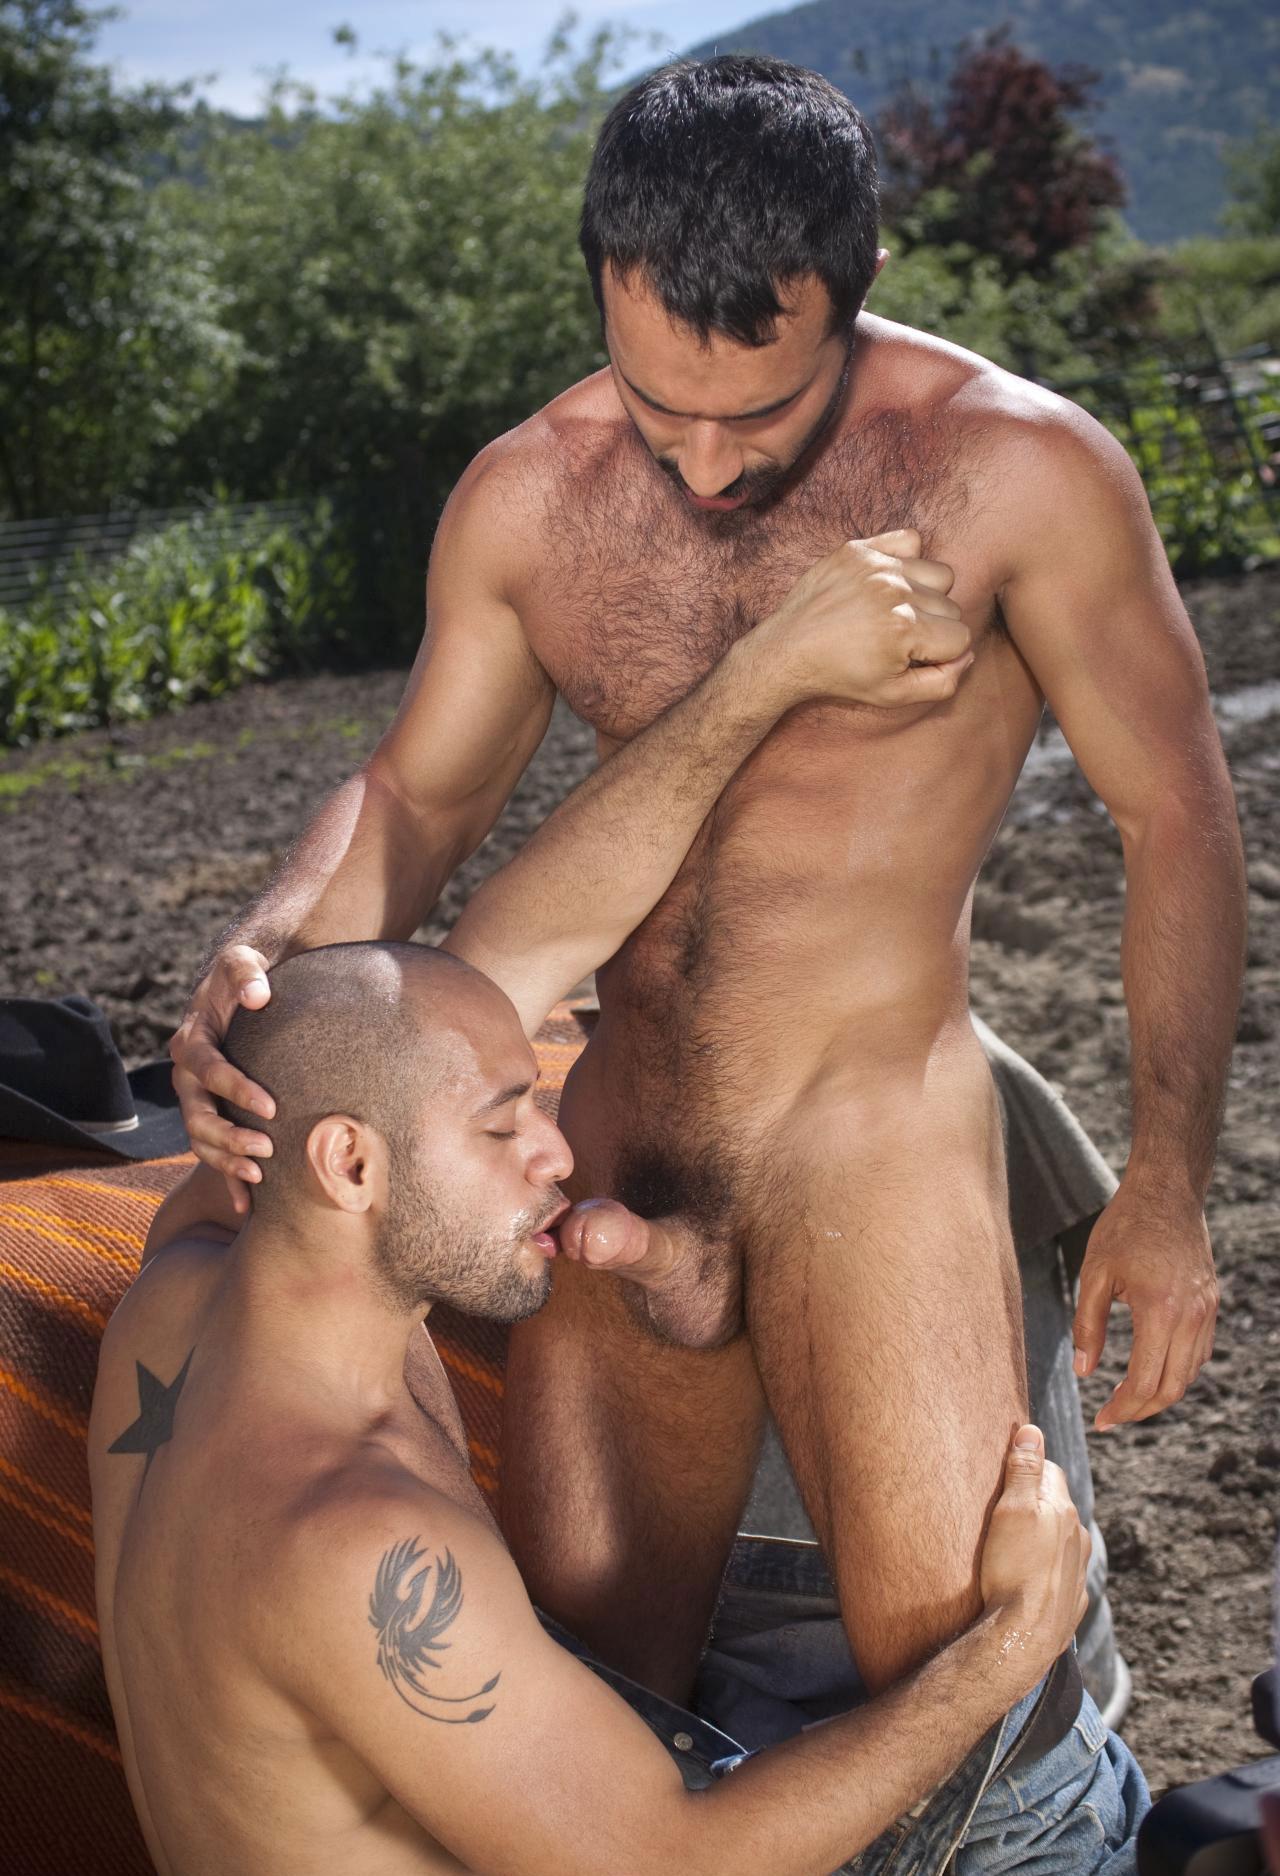 Gay guy erotic sexual